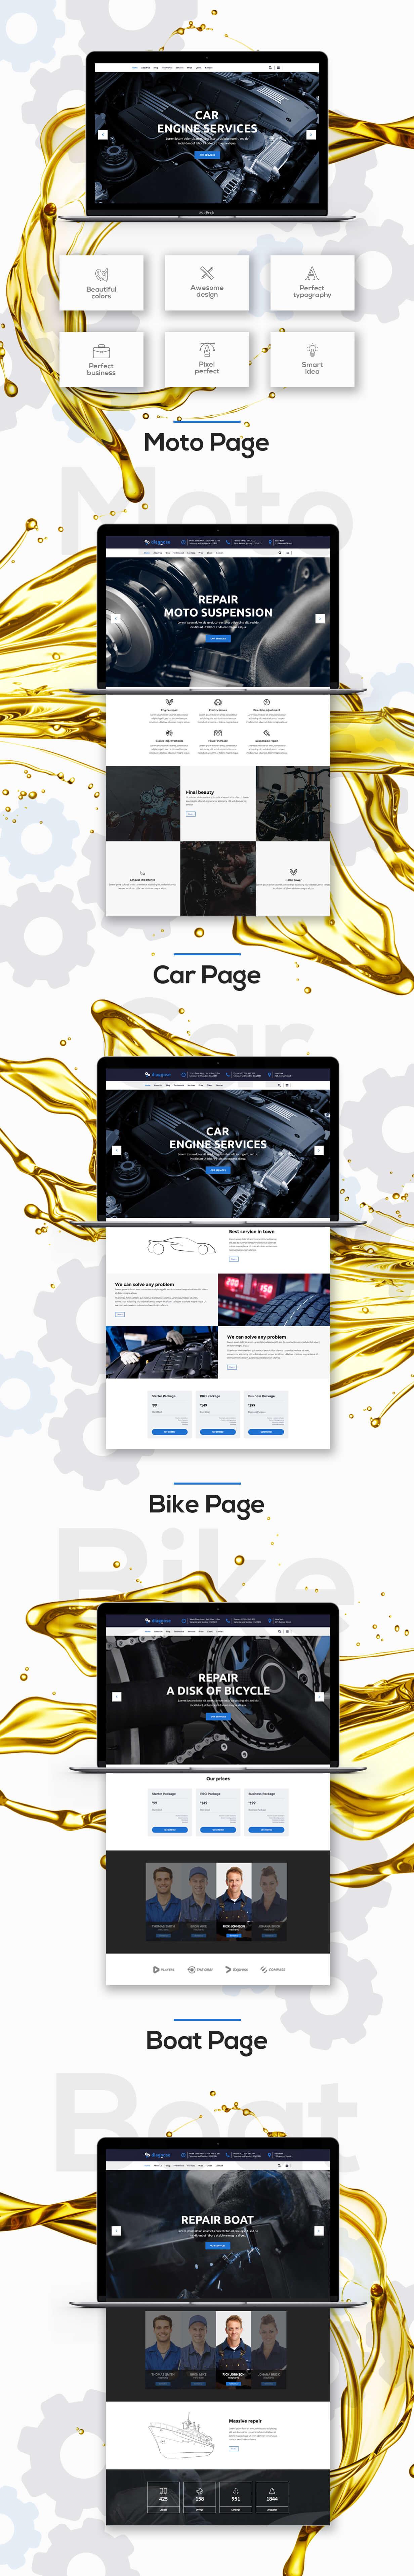 Diagnose - Autowerkstatt |  Mechaniker |  Workshop WordPress Theme - 1